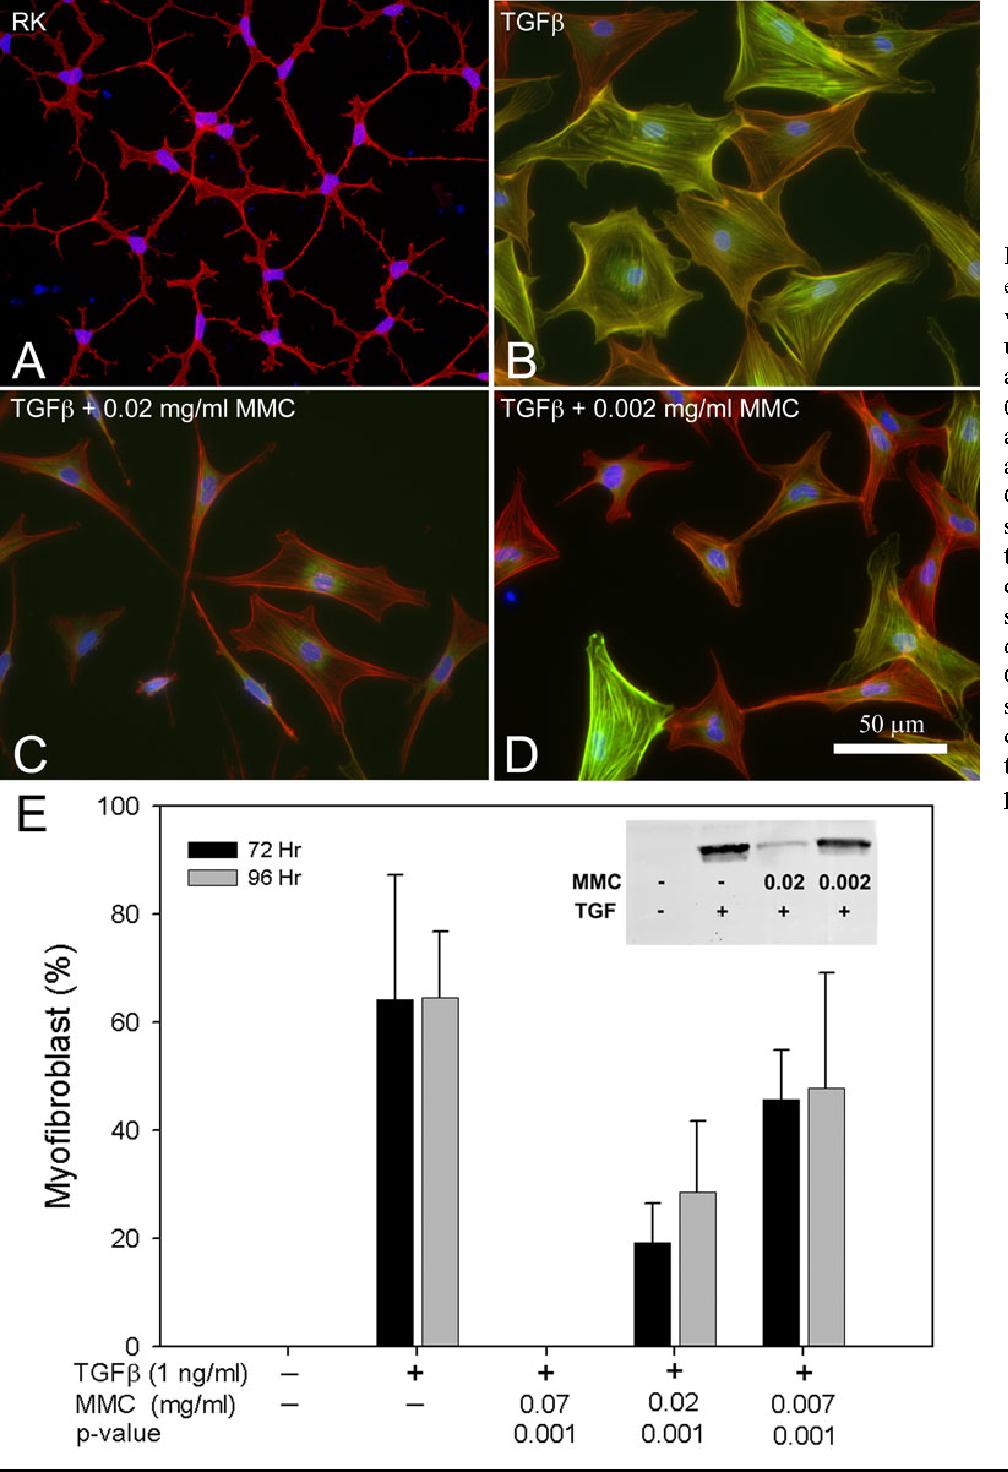 Quiescent keratocytes fail to repair MMC induced DNA damage